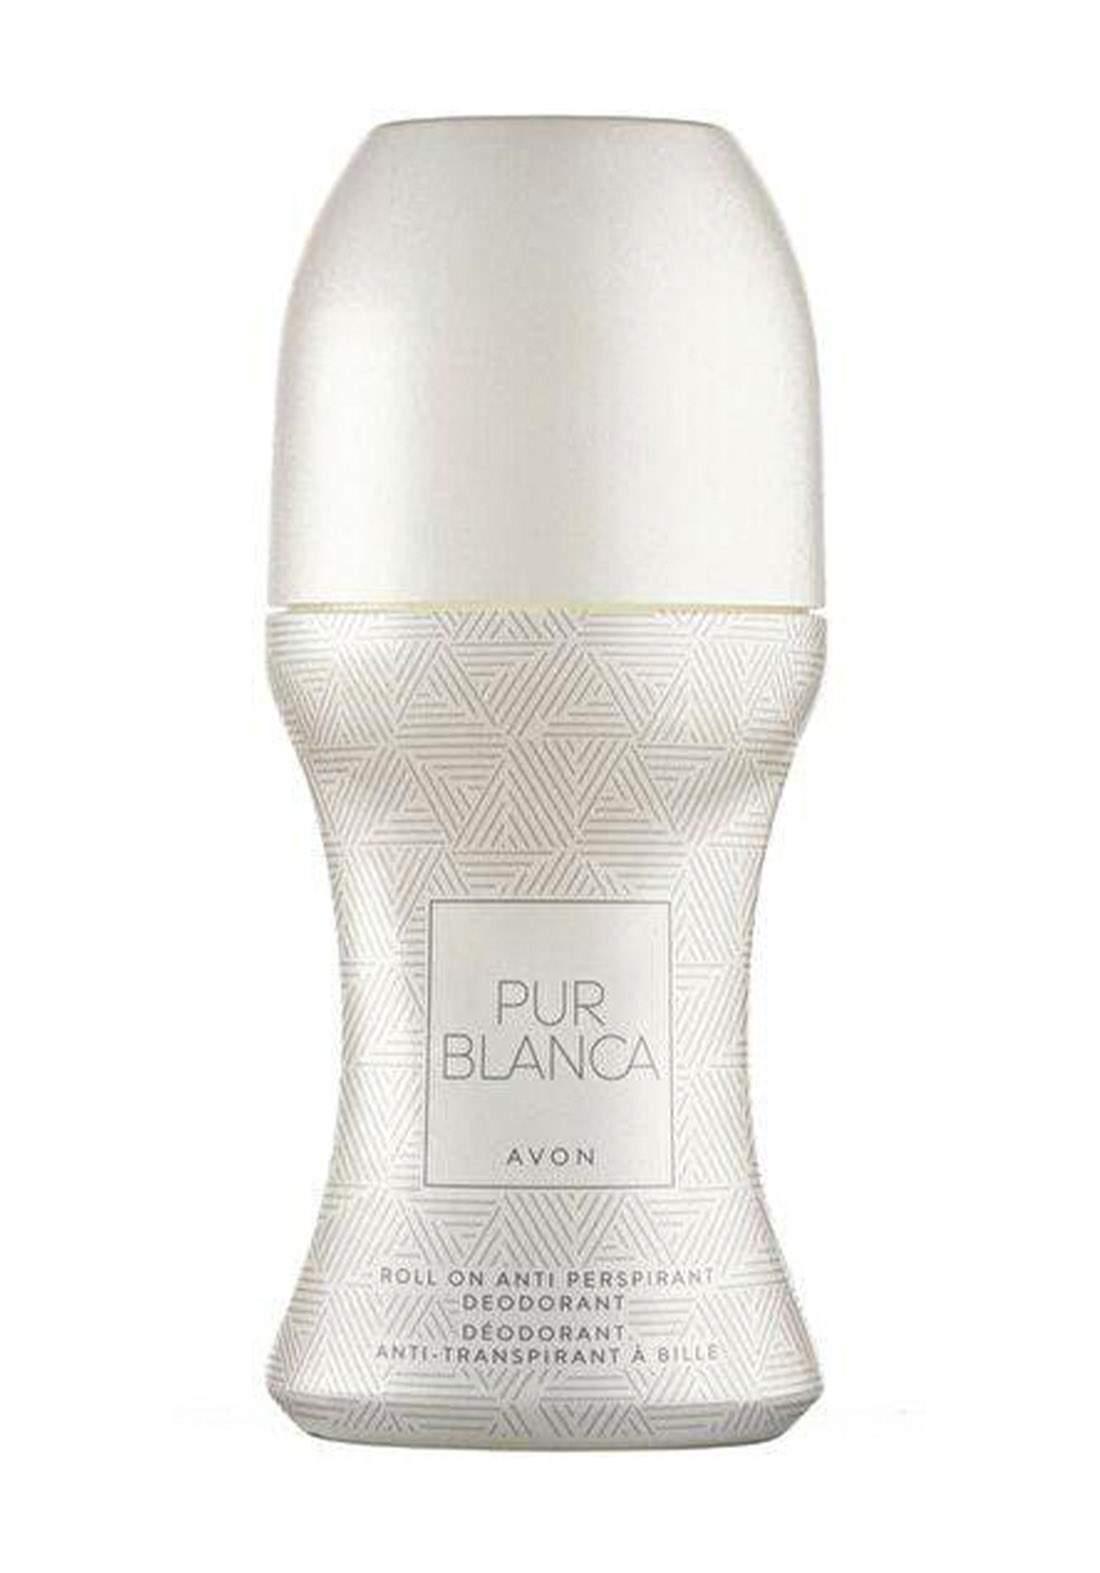 Avon 6826400 Purblanc Deodorant For Women 50 Ml   مزيل عرق